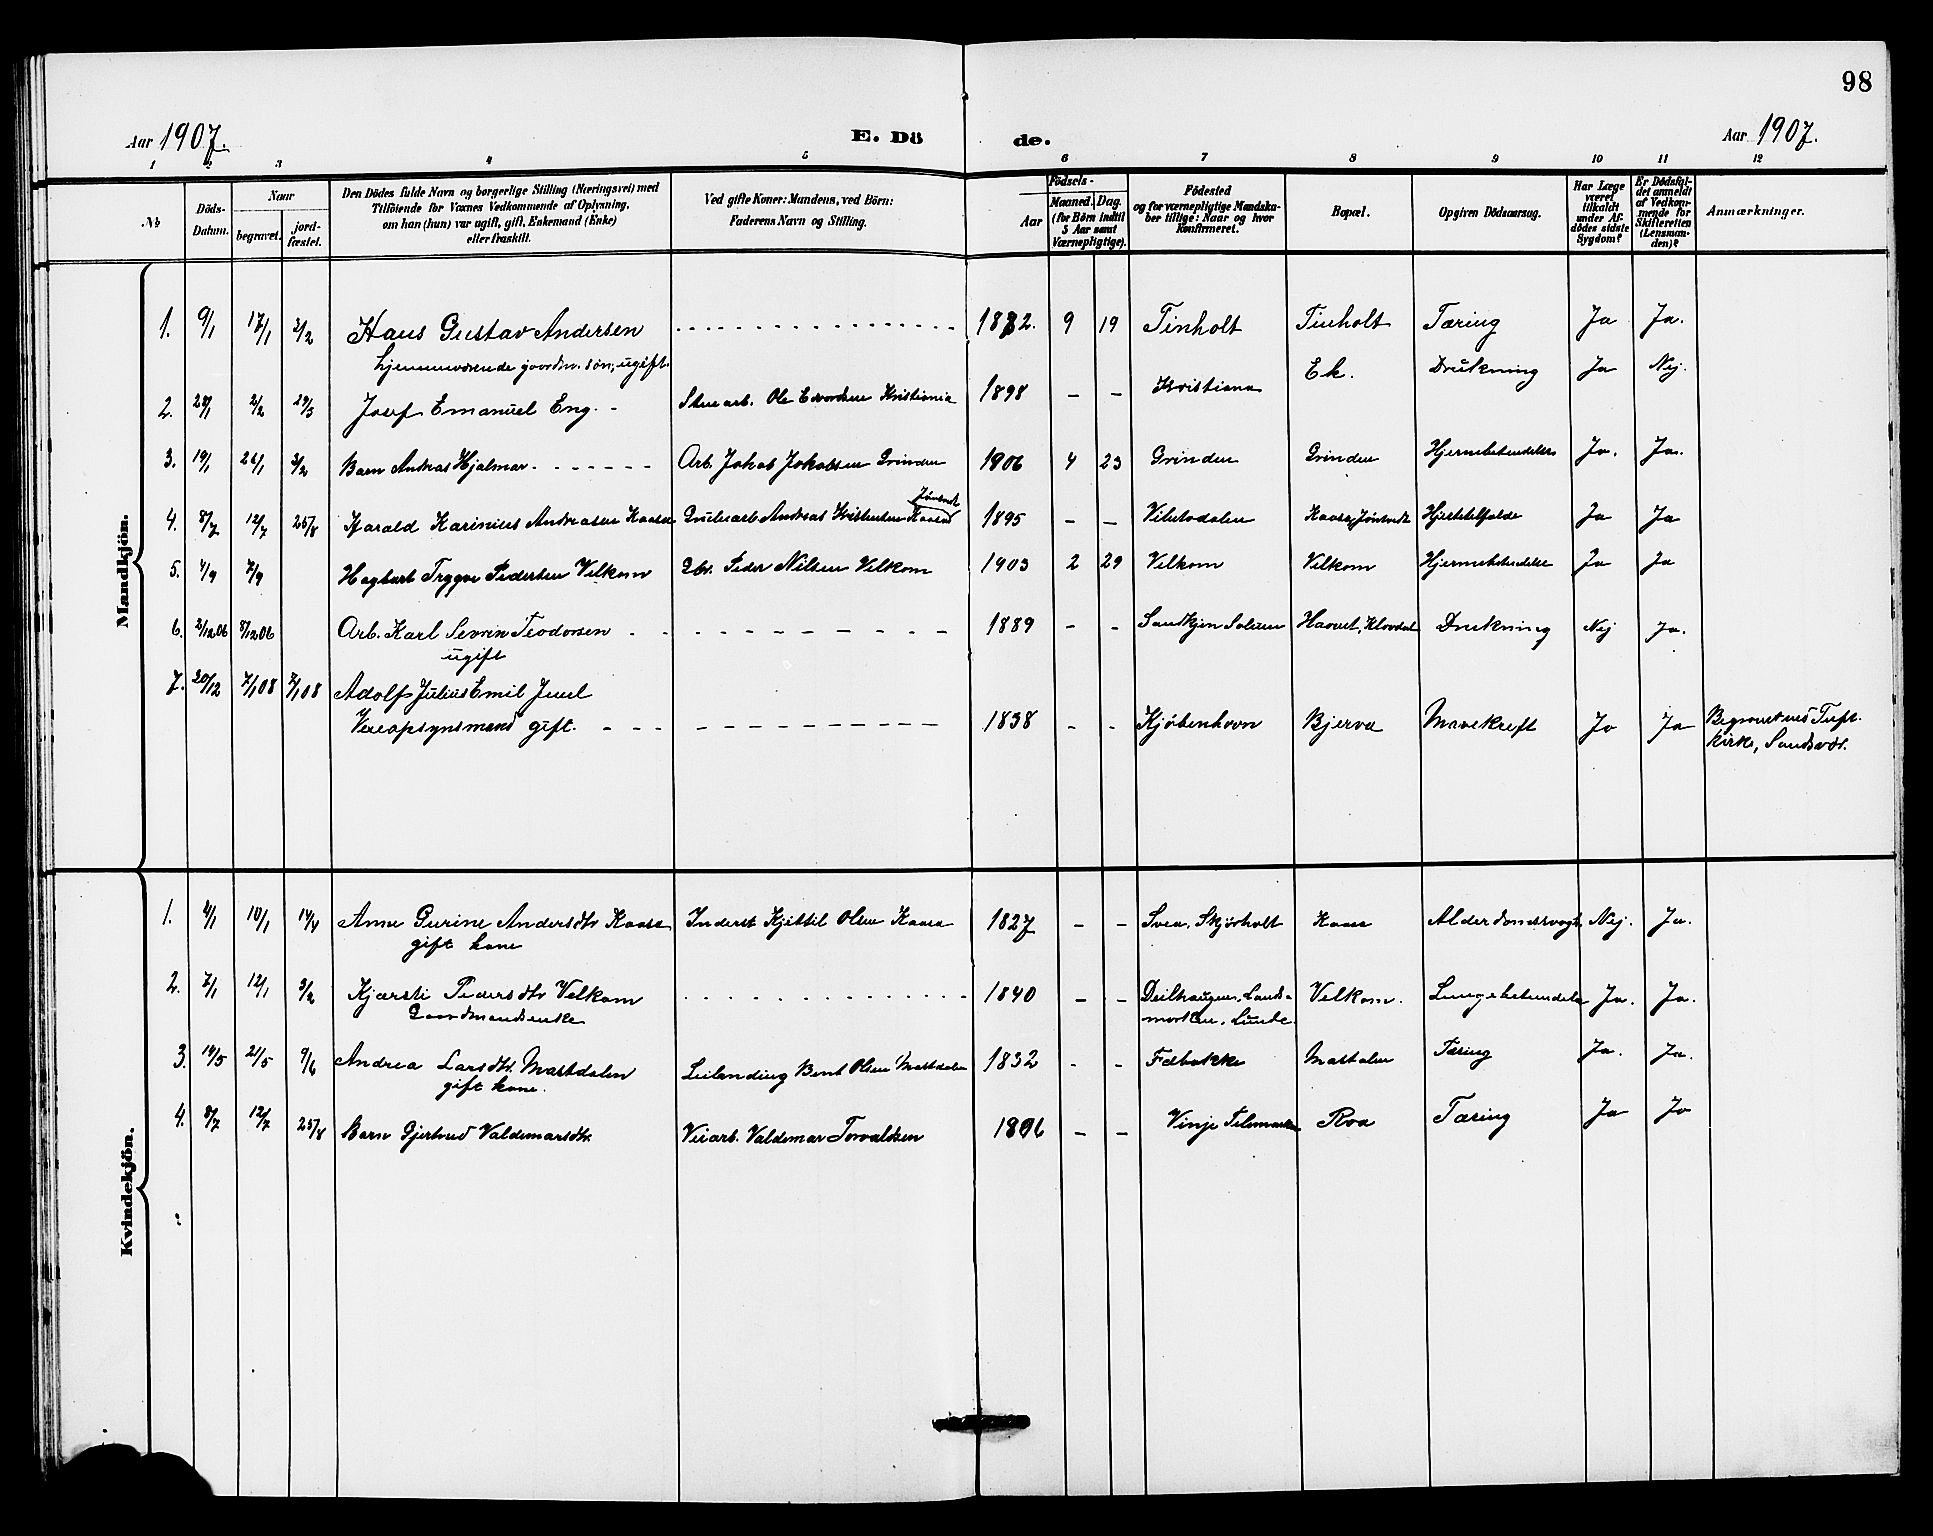 SAKO, Holla kirkebøker, G/Gb/L0002: Klokkerbok nr. II 2, 1897-1913, s. 98